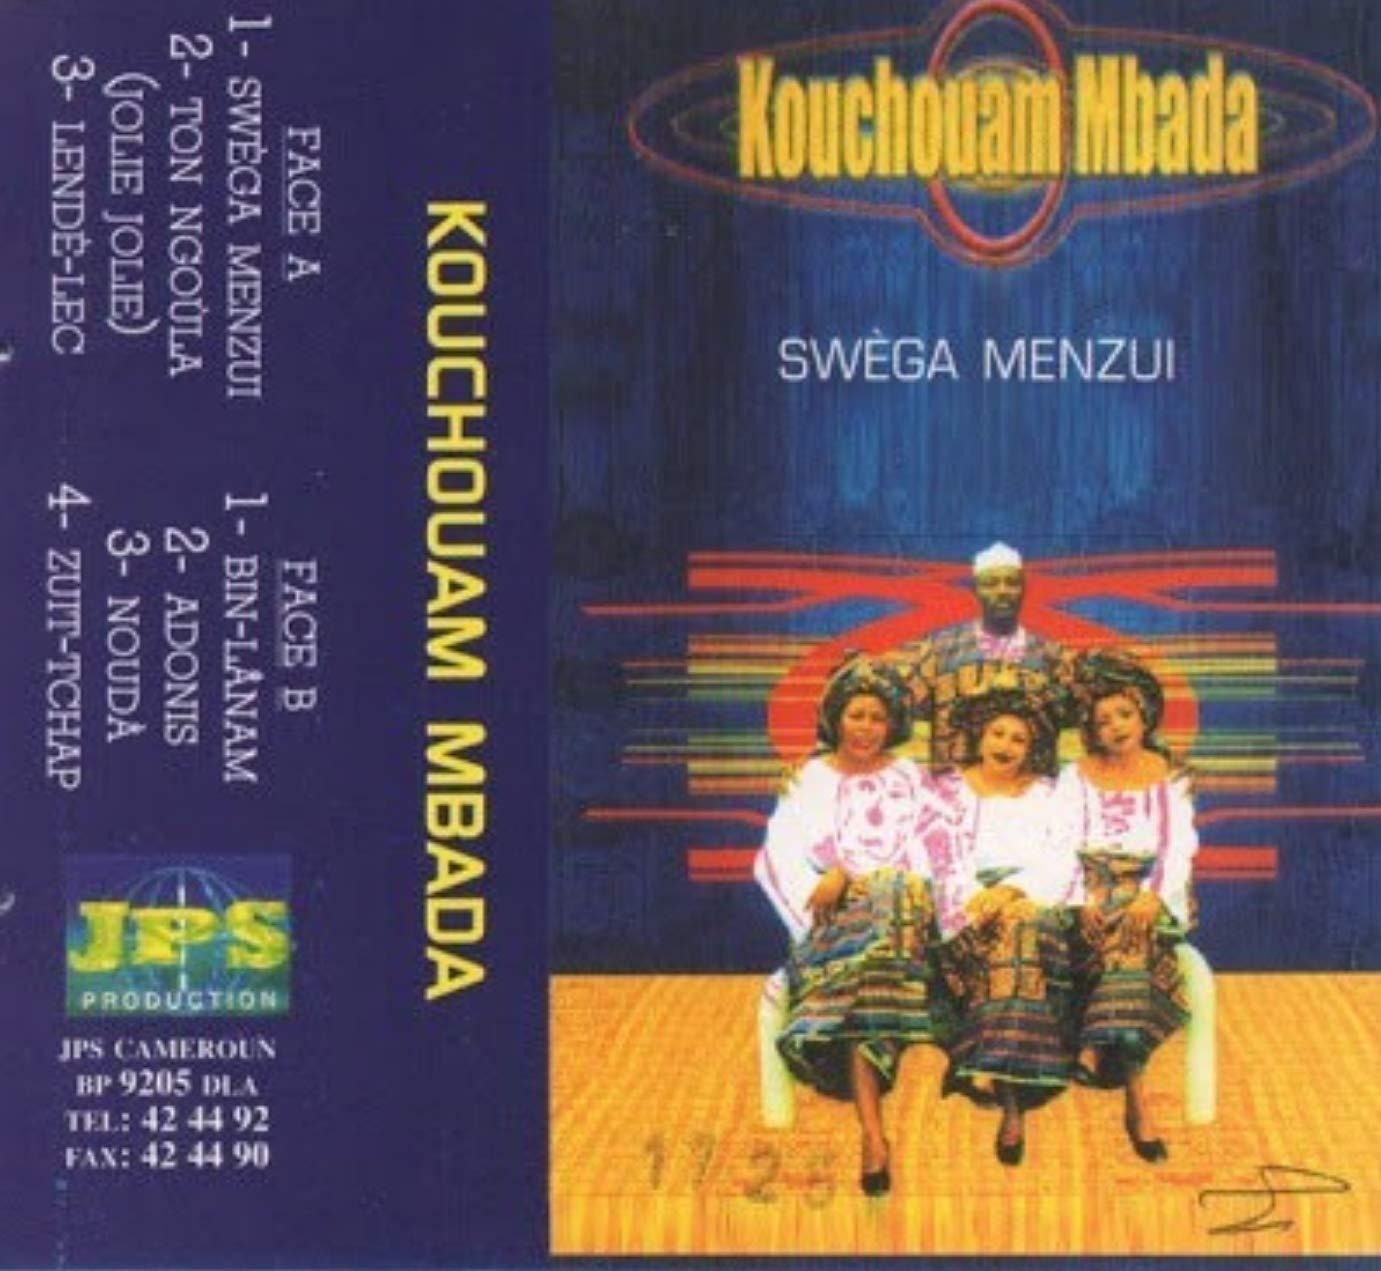 Swega Menzui by Kipepeo Publishing